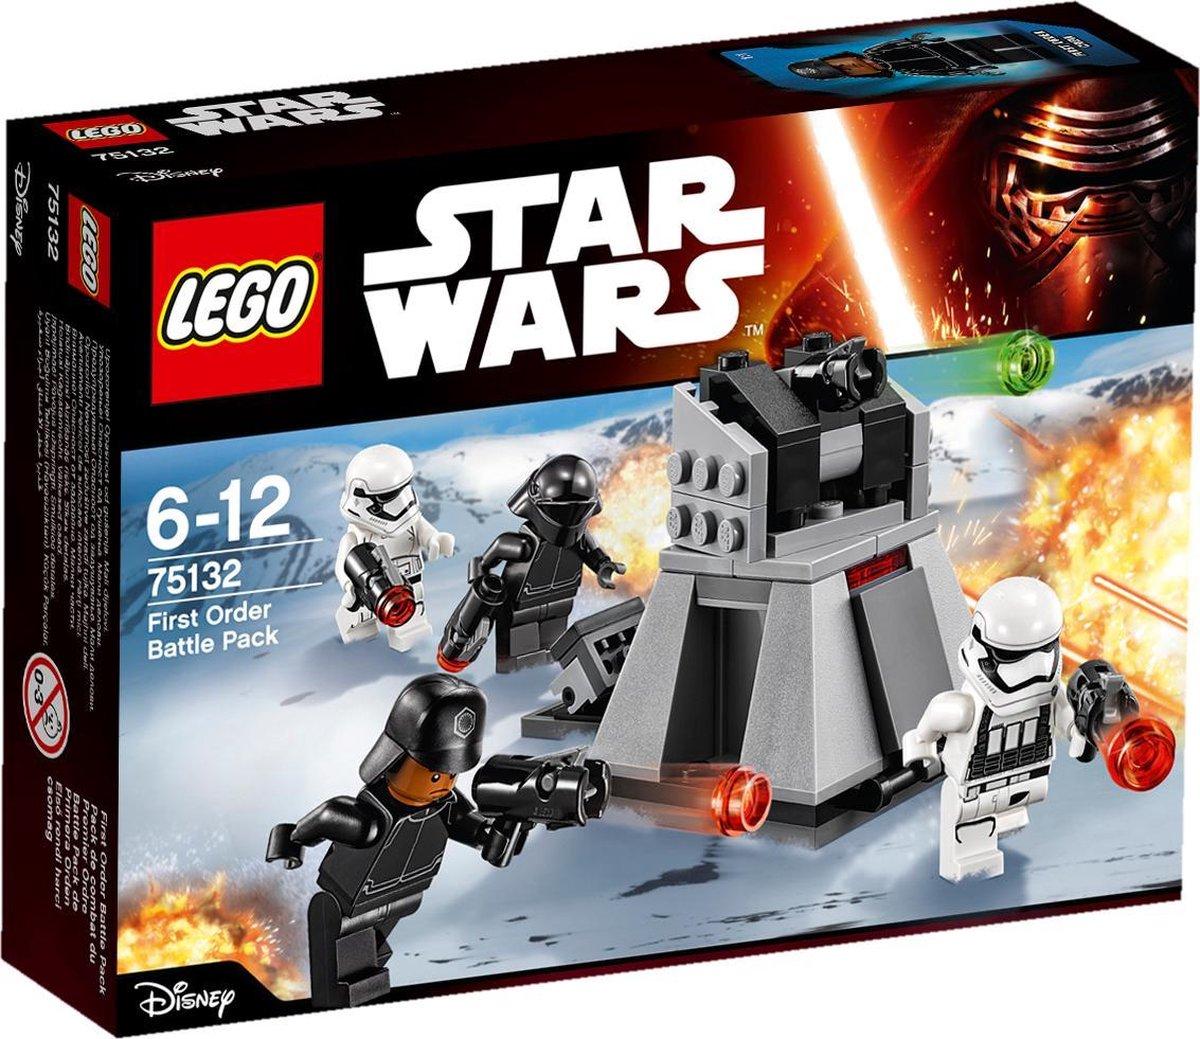 LEGO Star Wars First Order Battle Pack - 75132